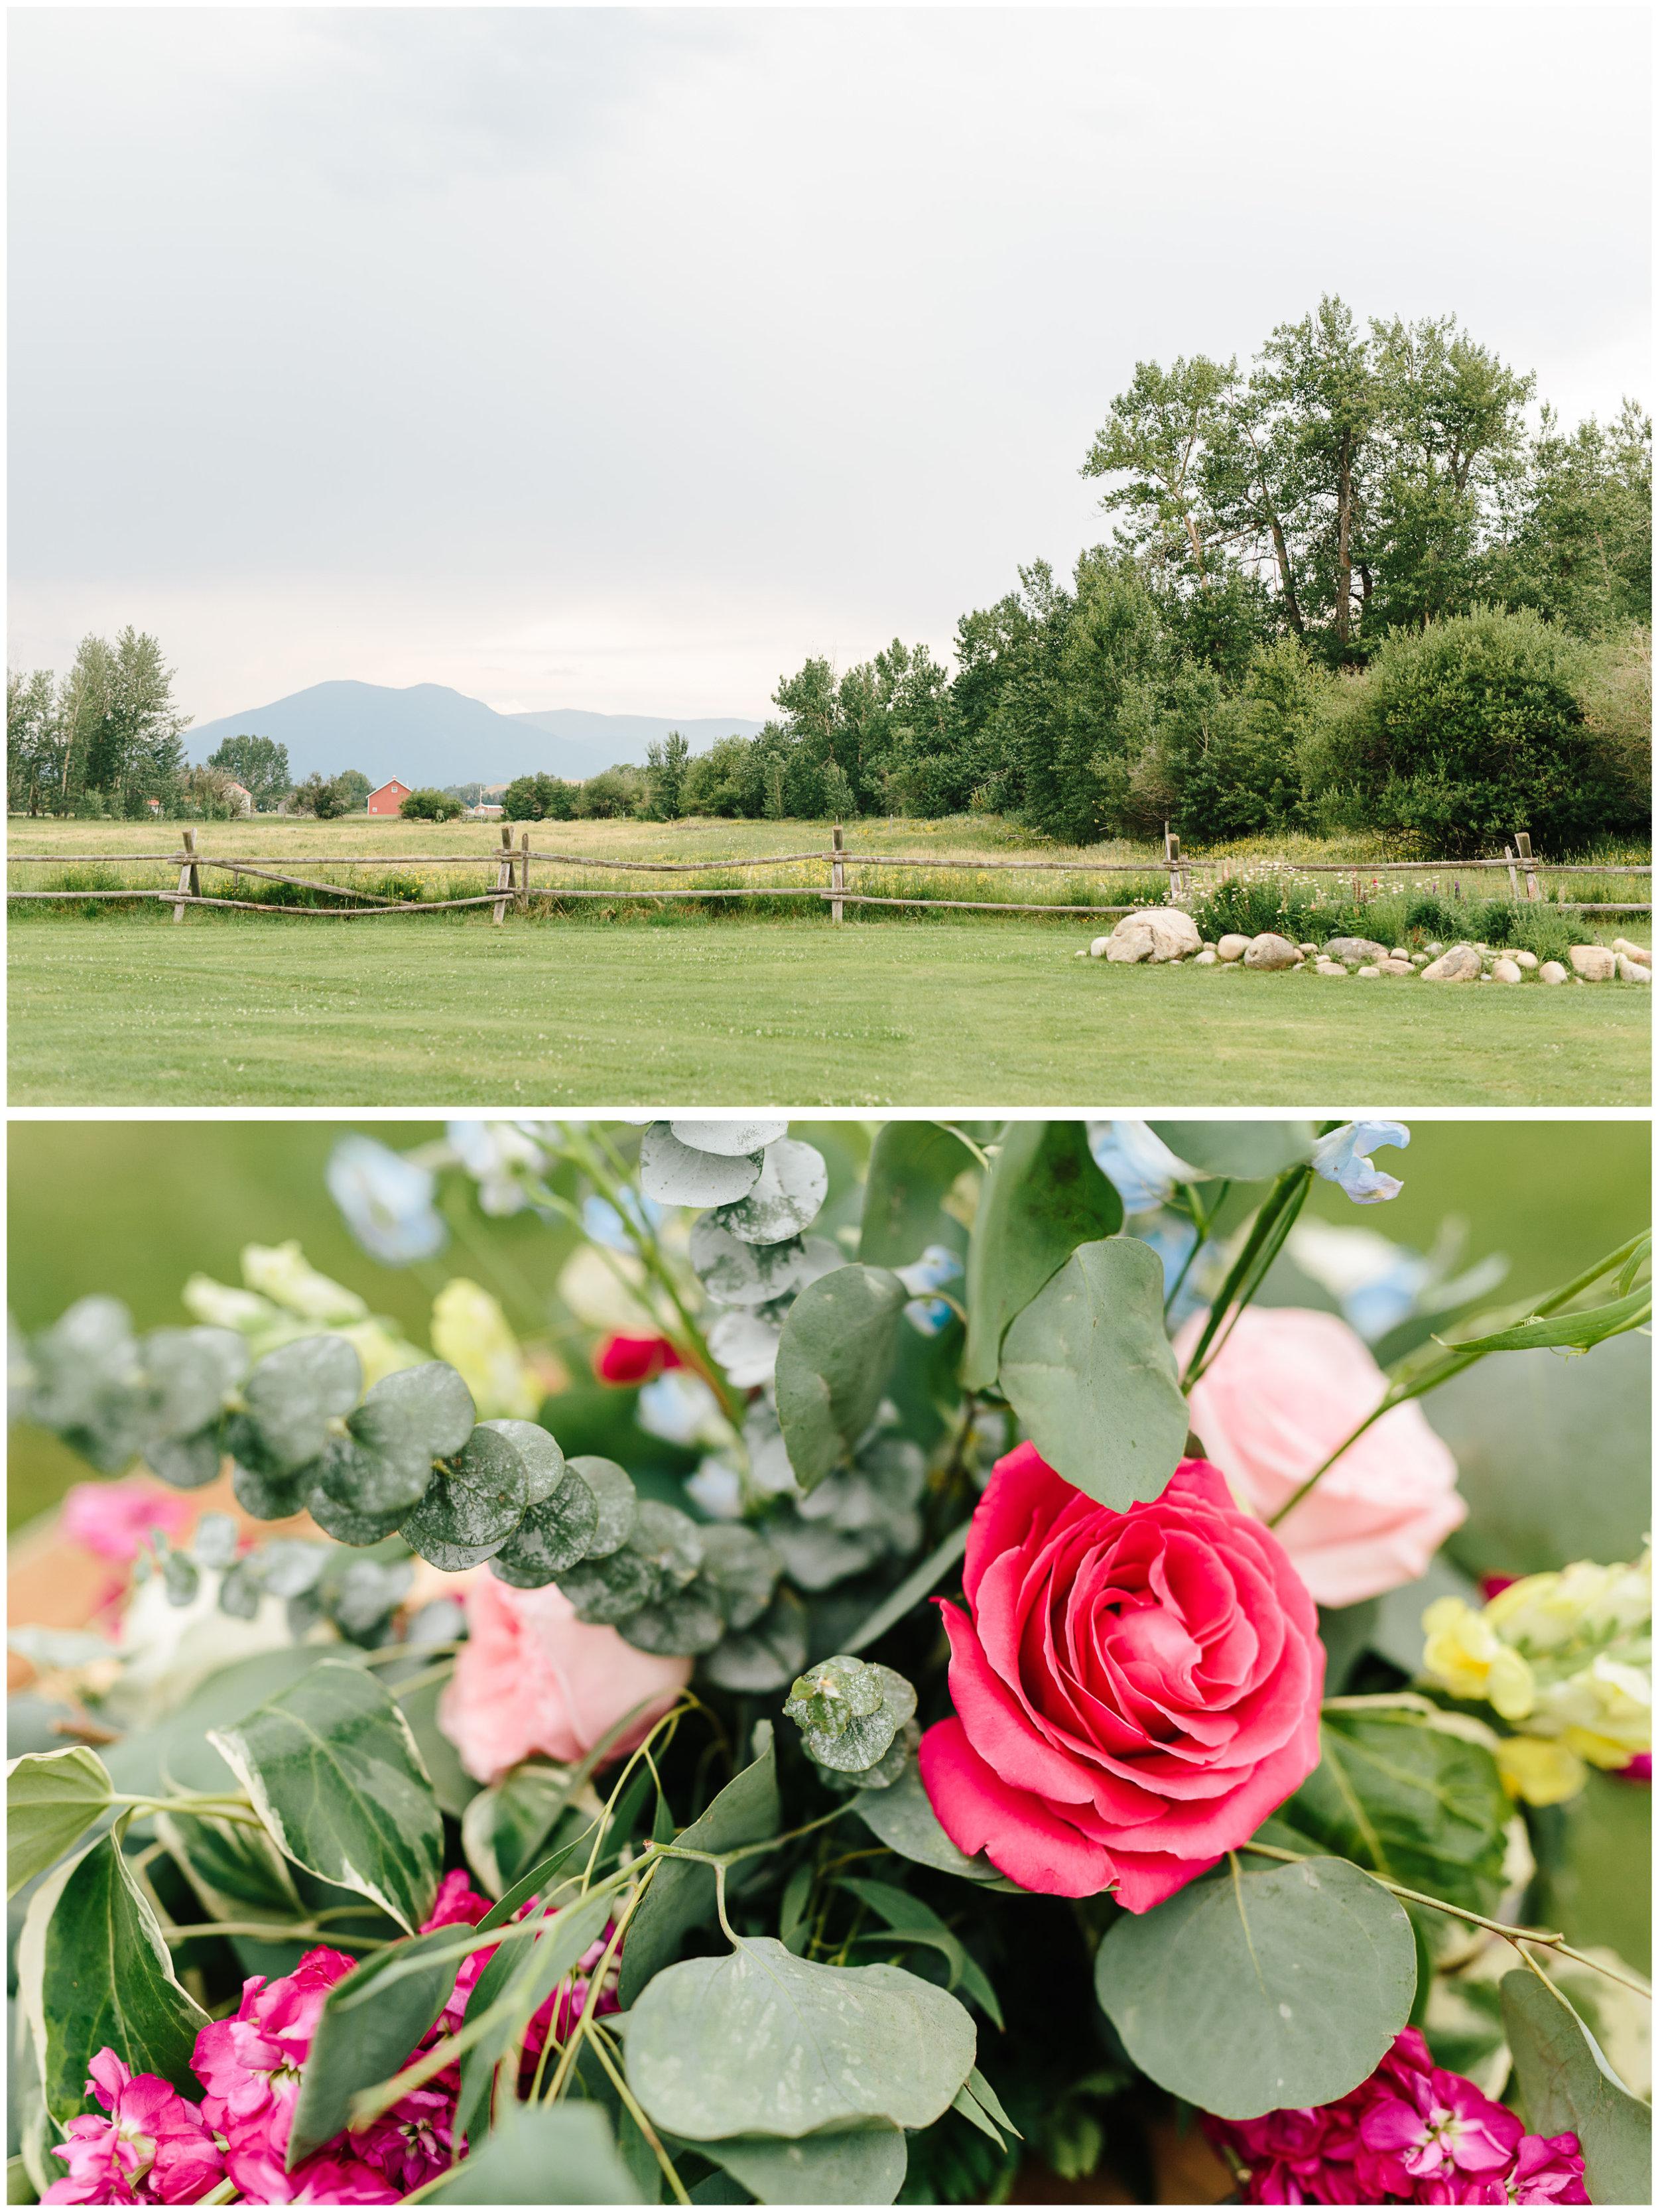 redlodge_montana_wedding_56.jpg